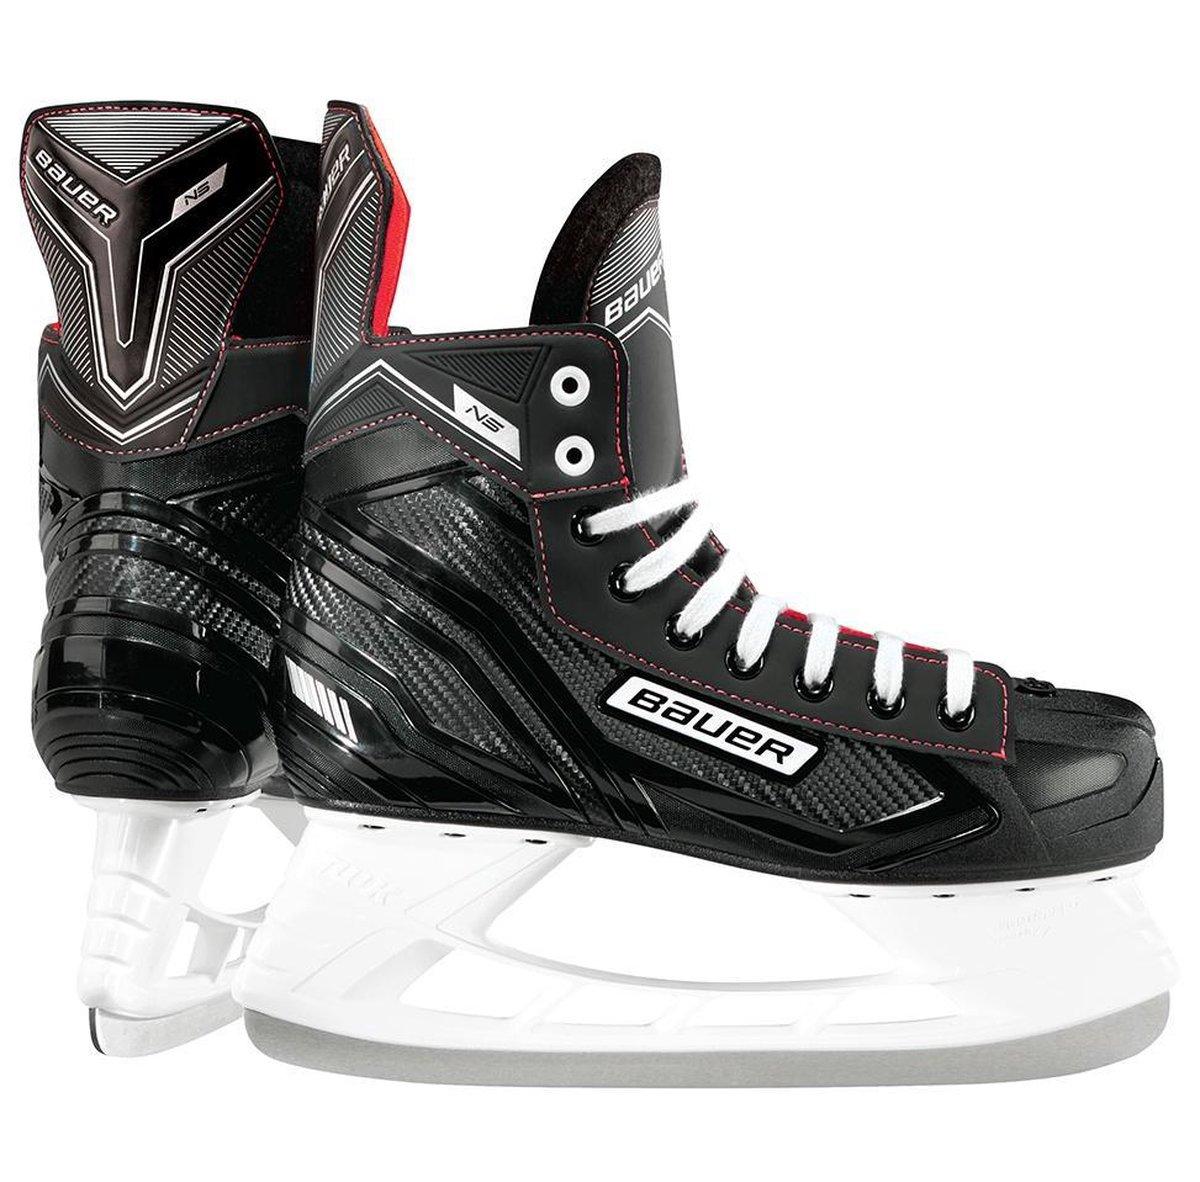 IJshockeyschaats Bauer NS Skate Youth R-Schoenmaat 28